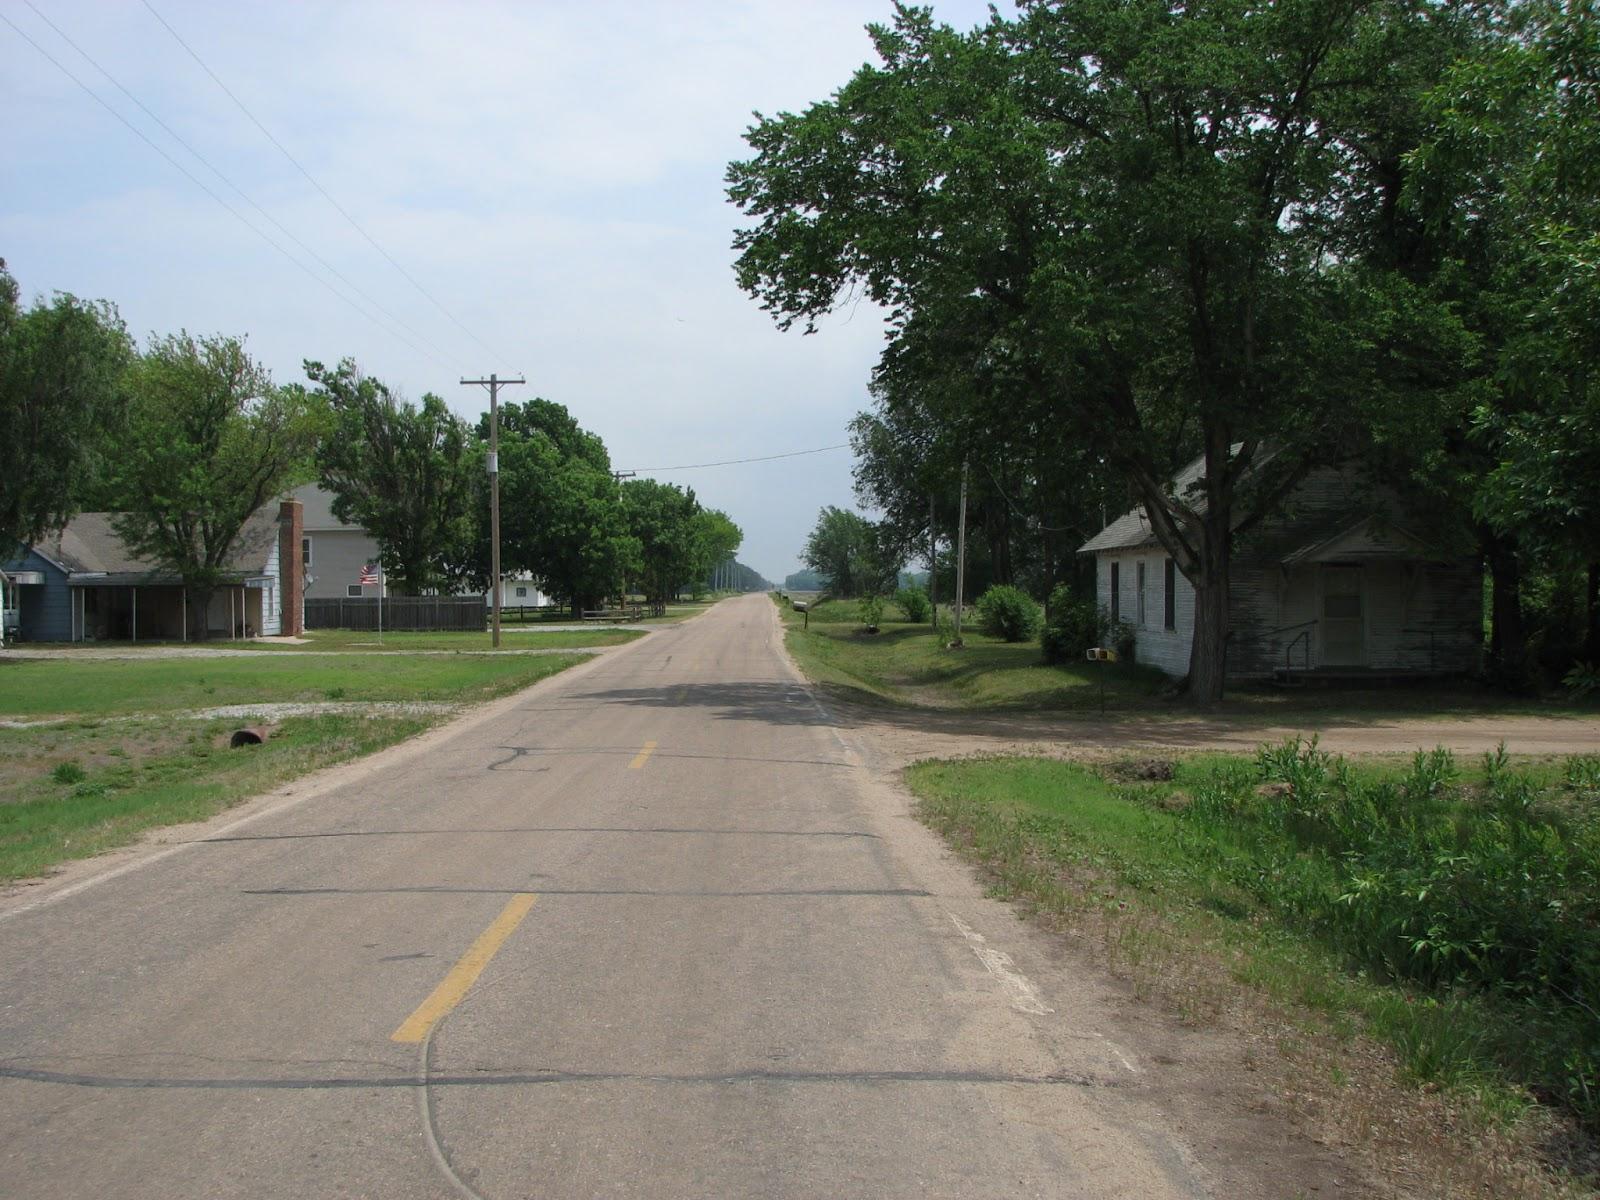 Kansas reno county turon - Darlow